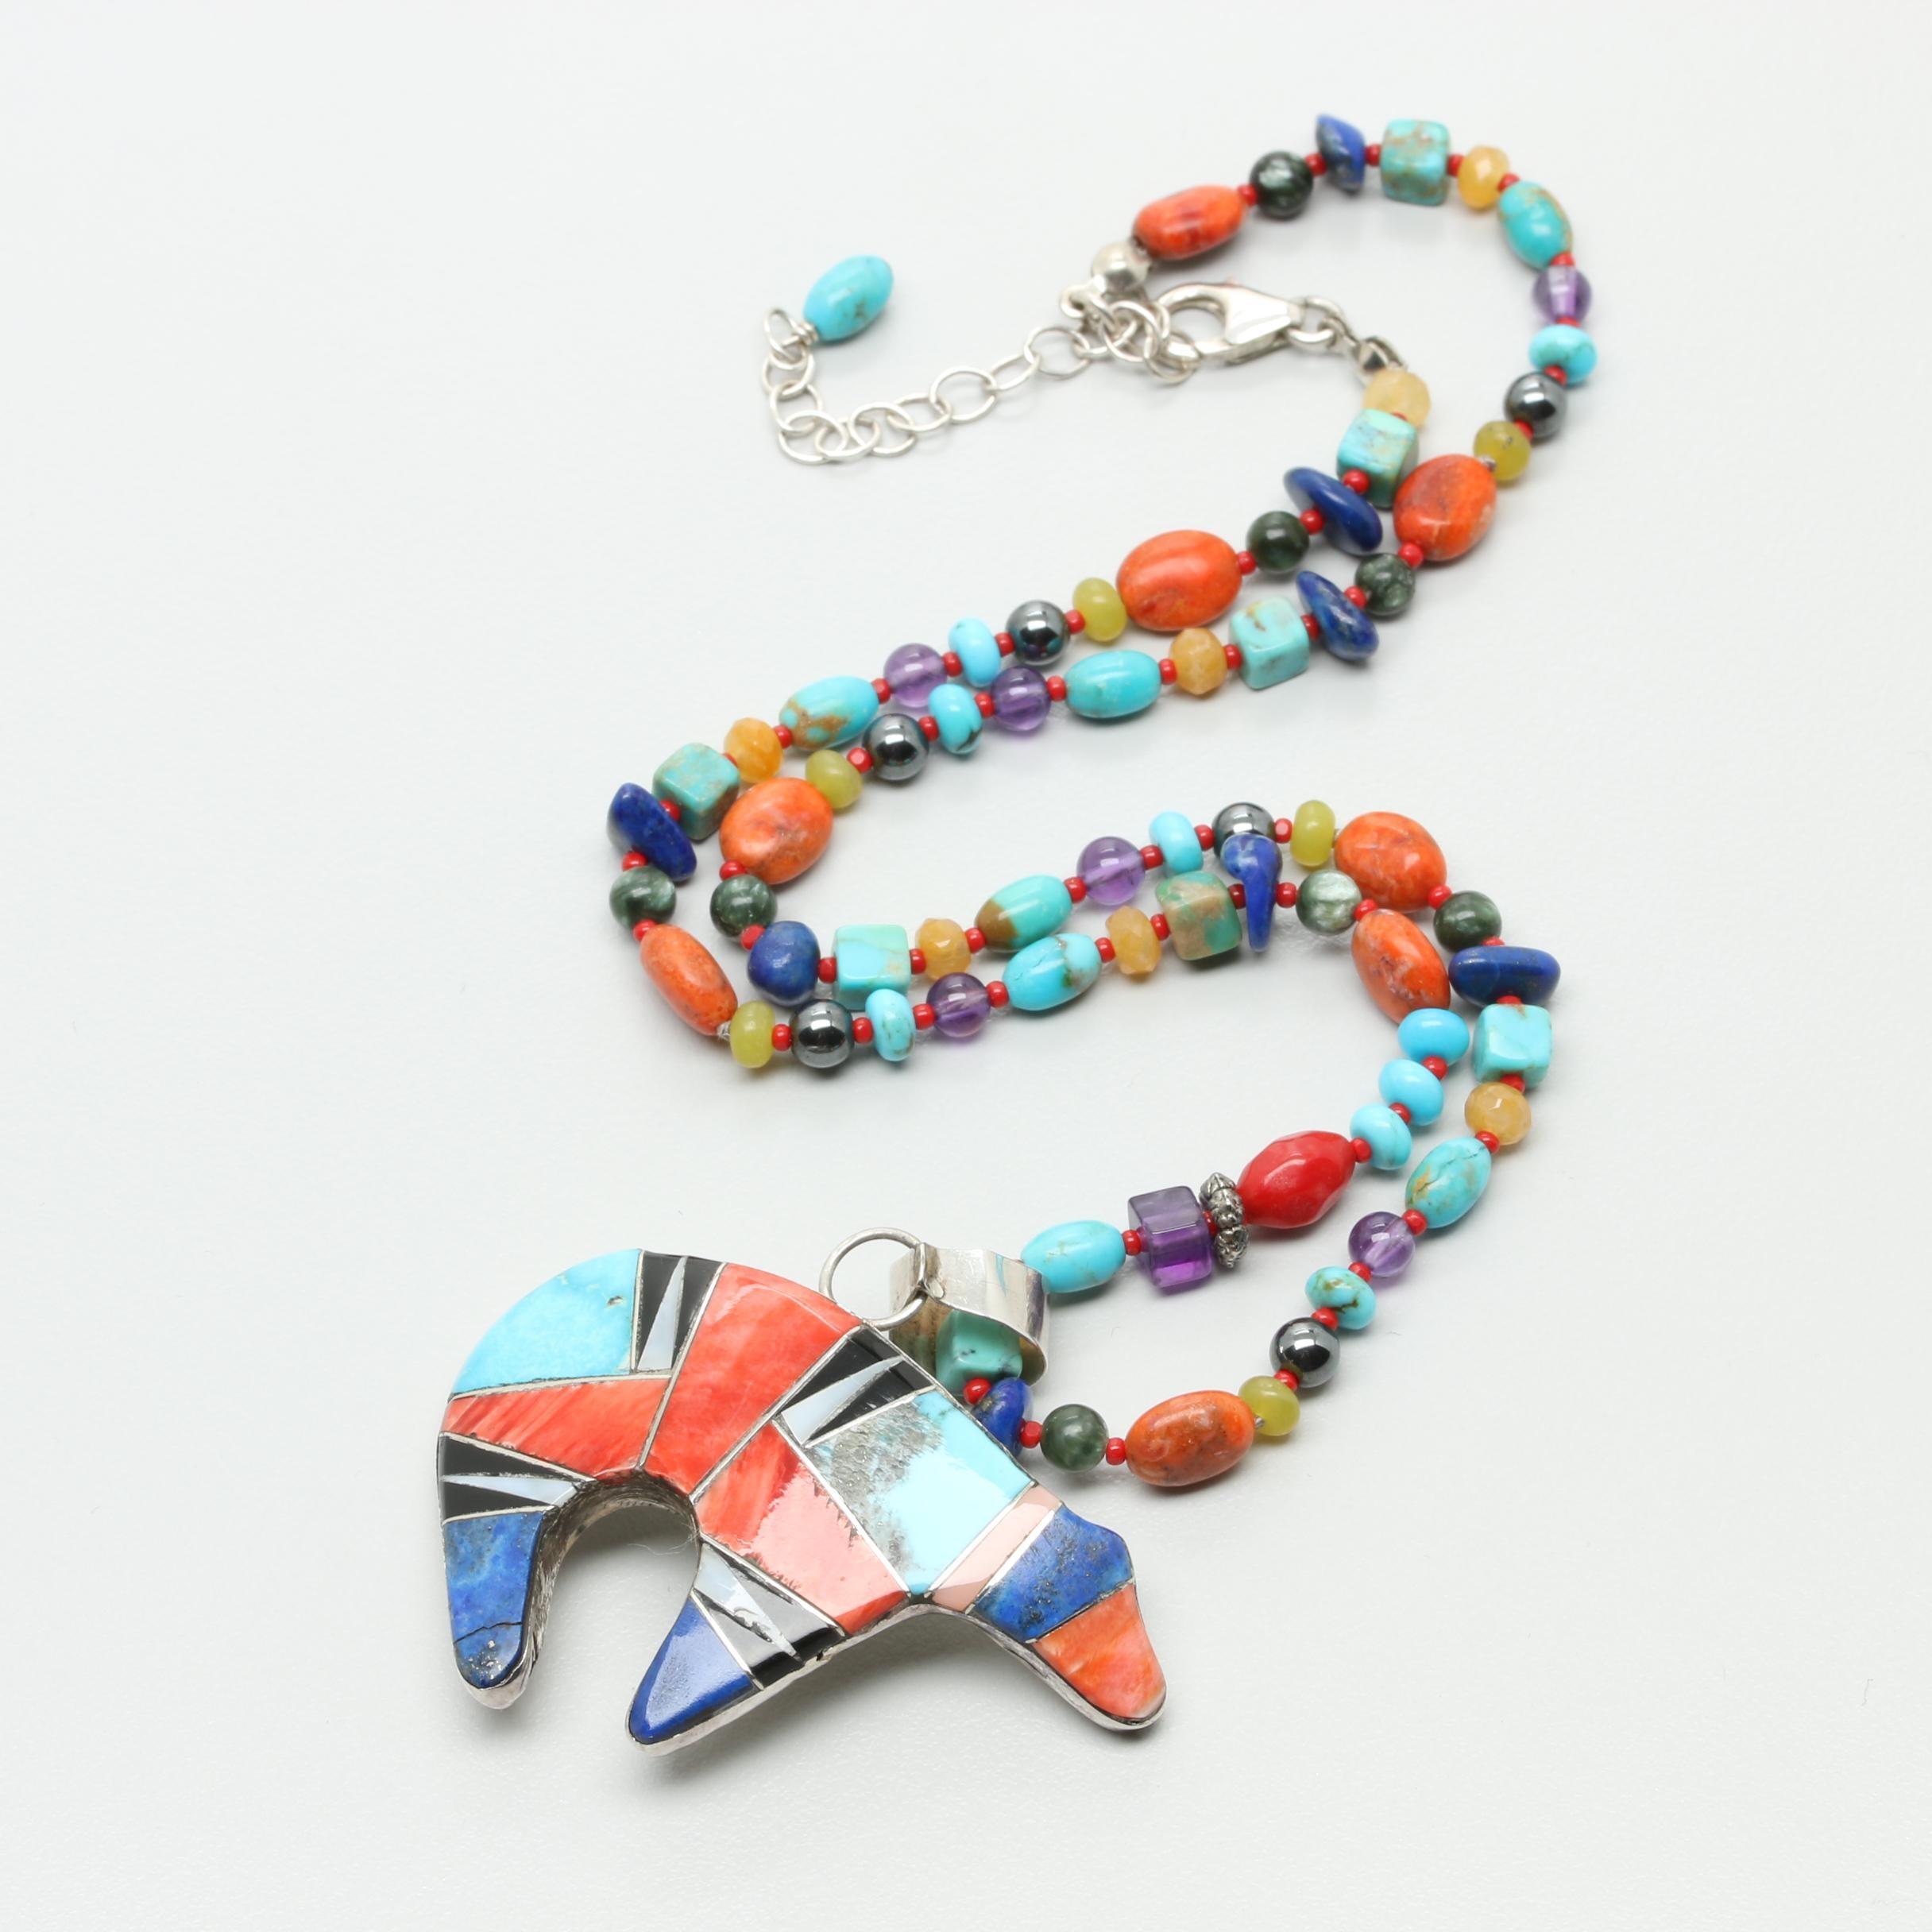 Southwestern Style Sterling Silver Bear Motif Pendant Necklace